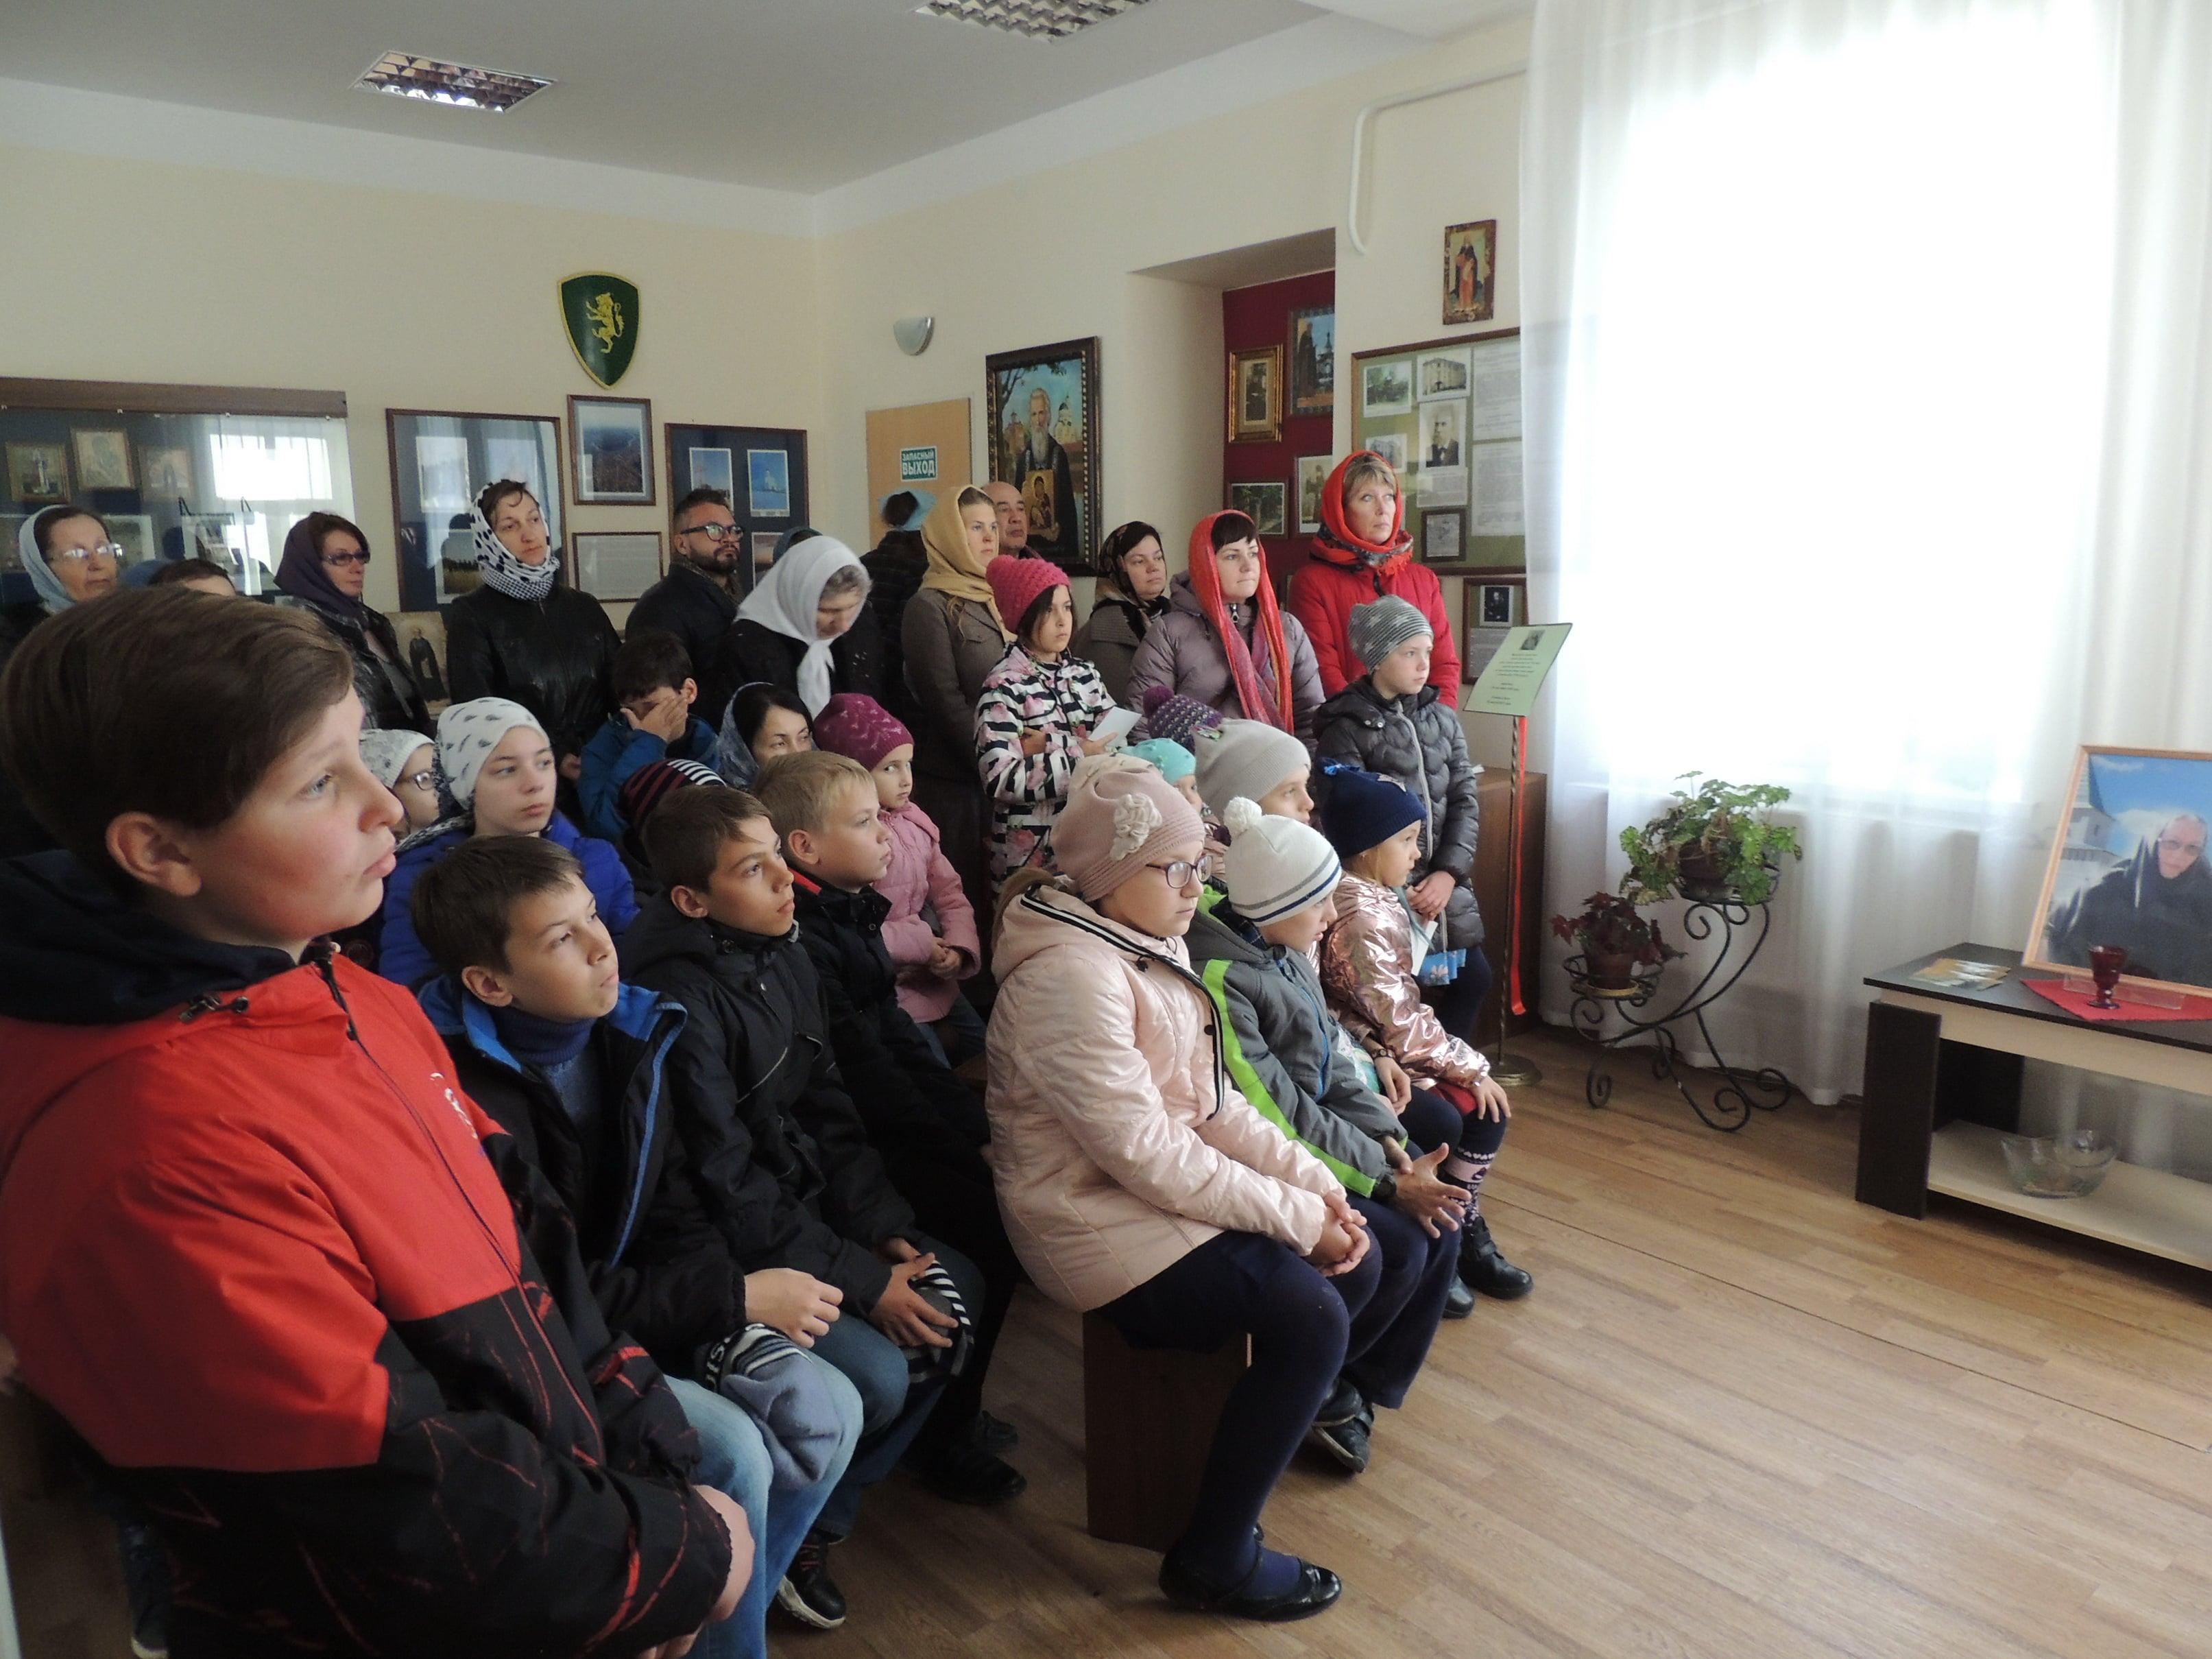 http://monuspen.ru/photoreports/7df66090564ac3621568a9866ab706aj.JPG